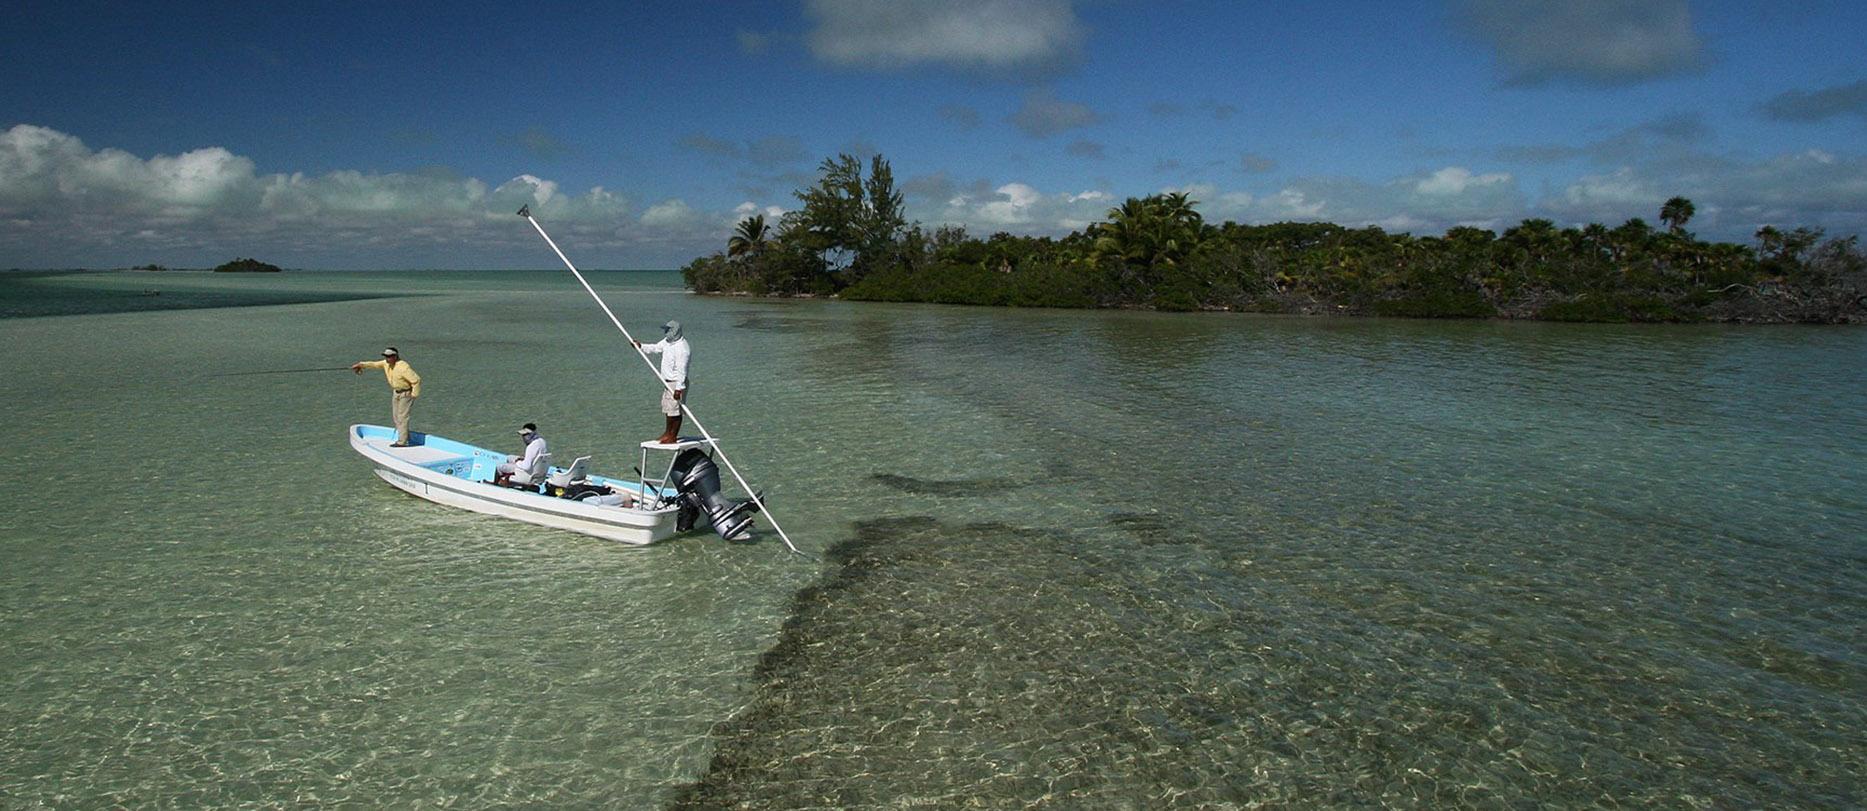 Tarpon Bonefish Permit Fly Fishing Lodge Mexico Best Flats Fishing Mexico